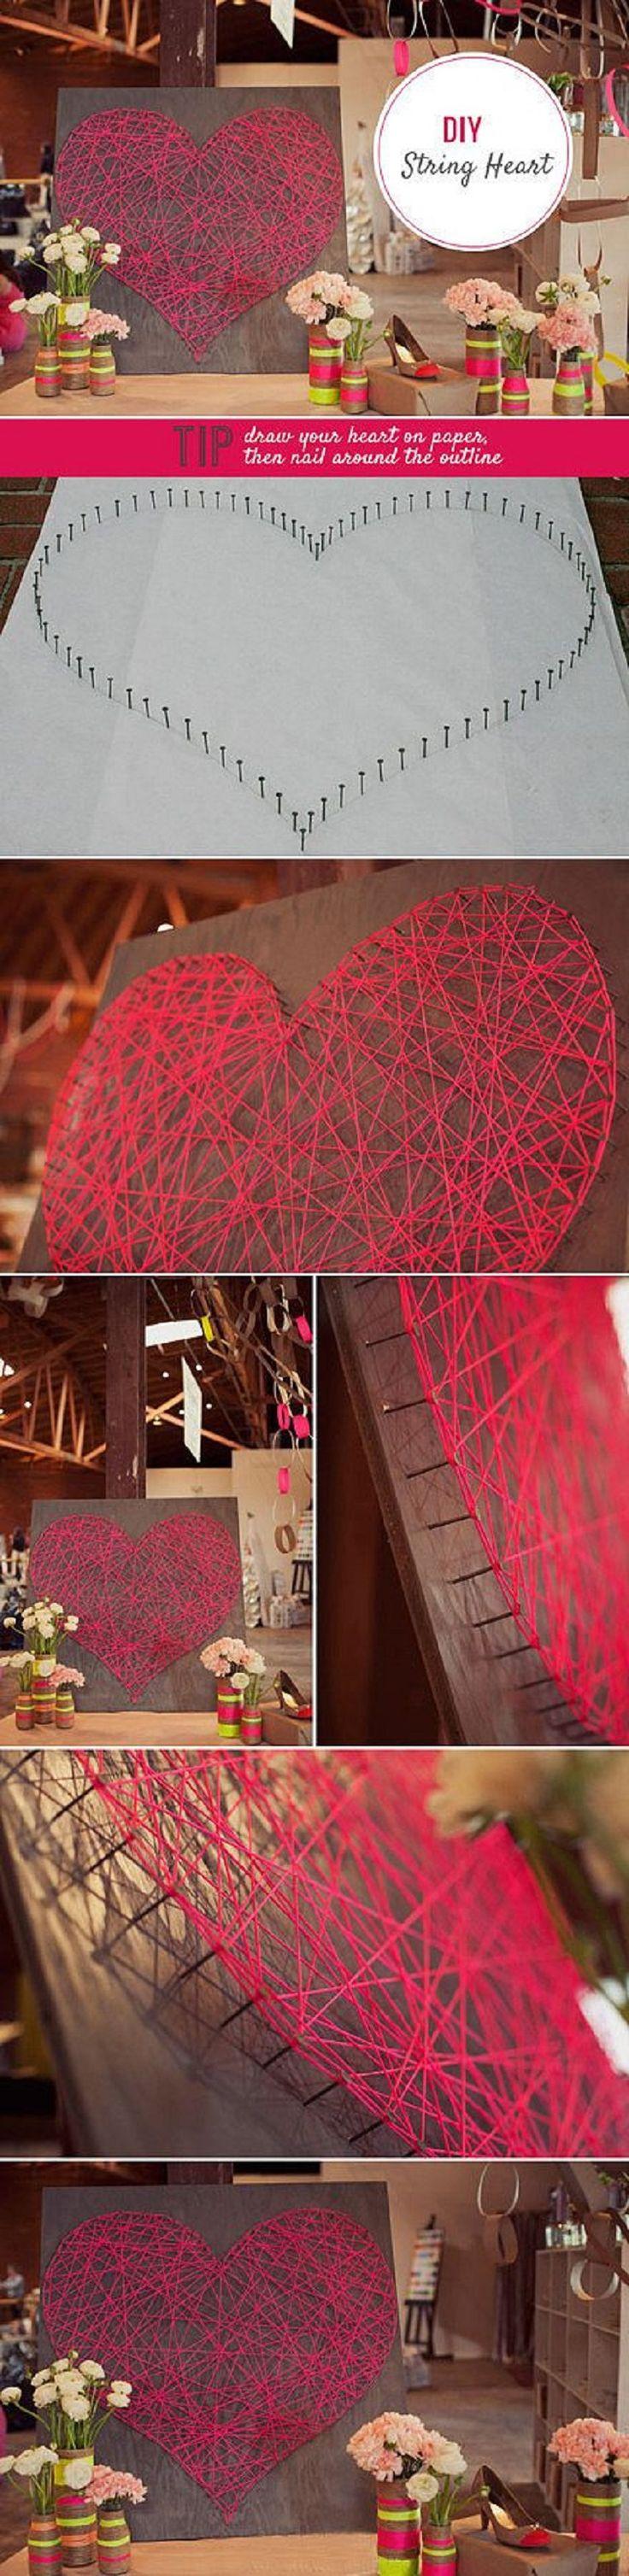 DIY String Heart - 15 Lovey-Dovey DIY Valentine's Day Decorations to Celebrate Love | GleamItUp